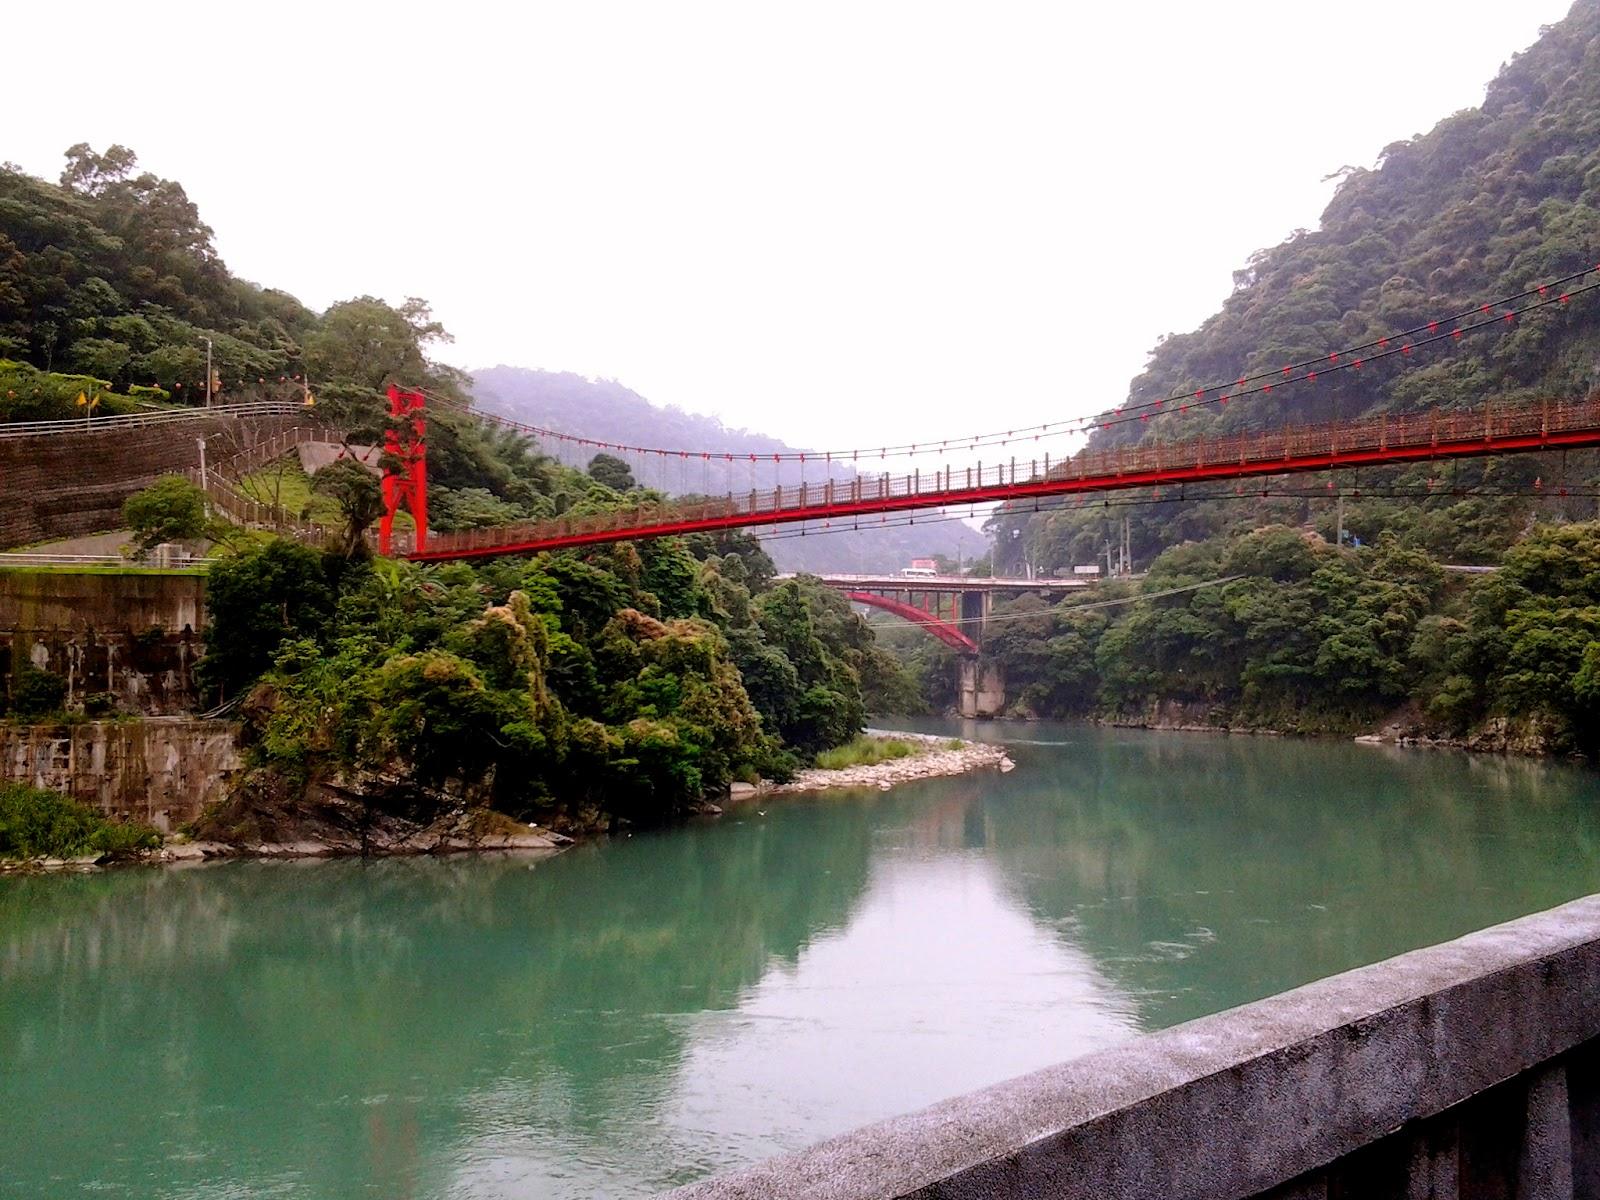 Red Bridge Wulai Xindian Taiwan